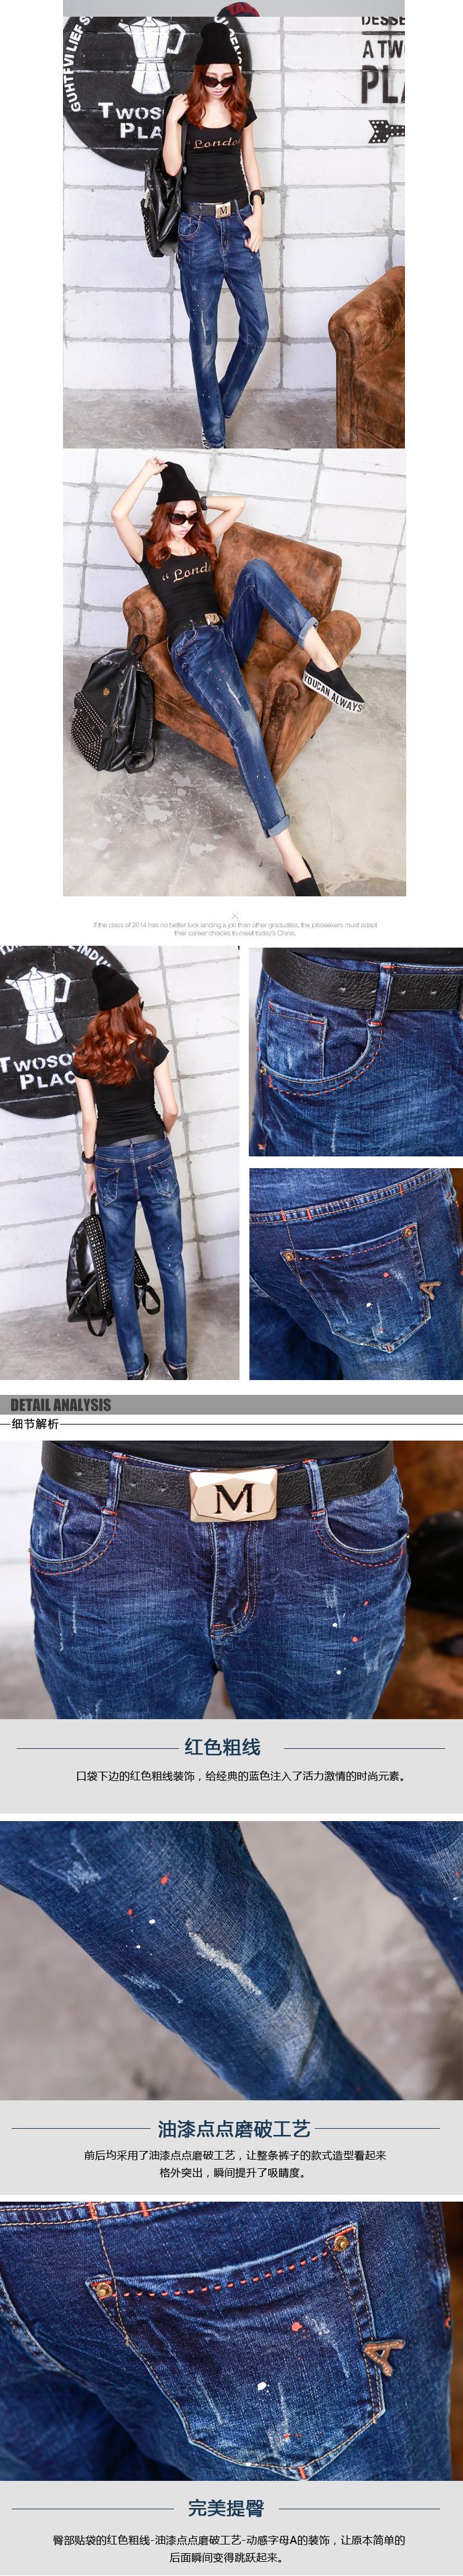 Скидки на 2016 шаровары карандаш брюки джинсы женщина pantalon femme vaqueros mujer